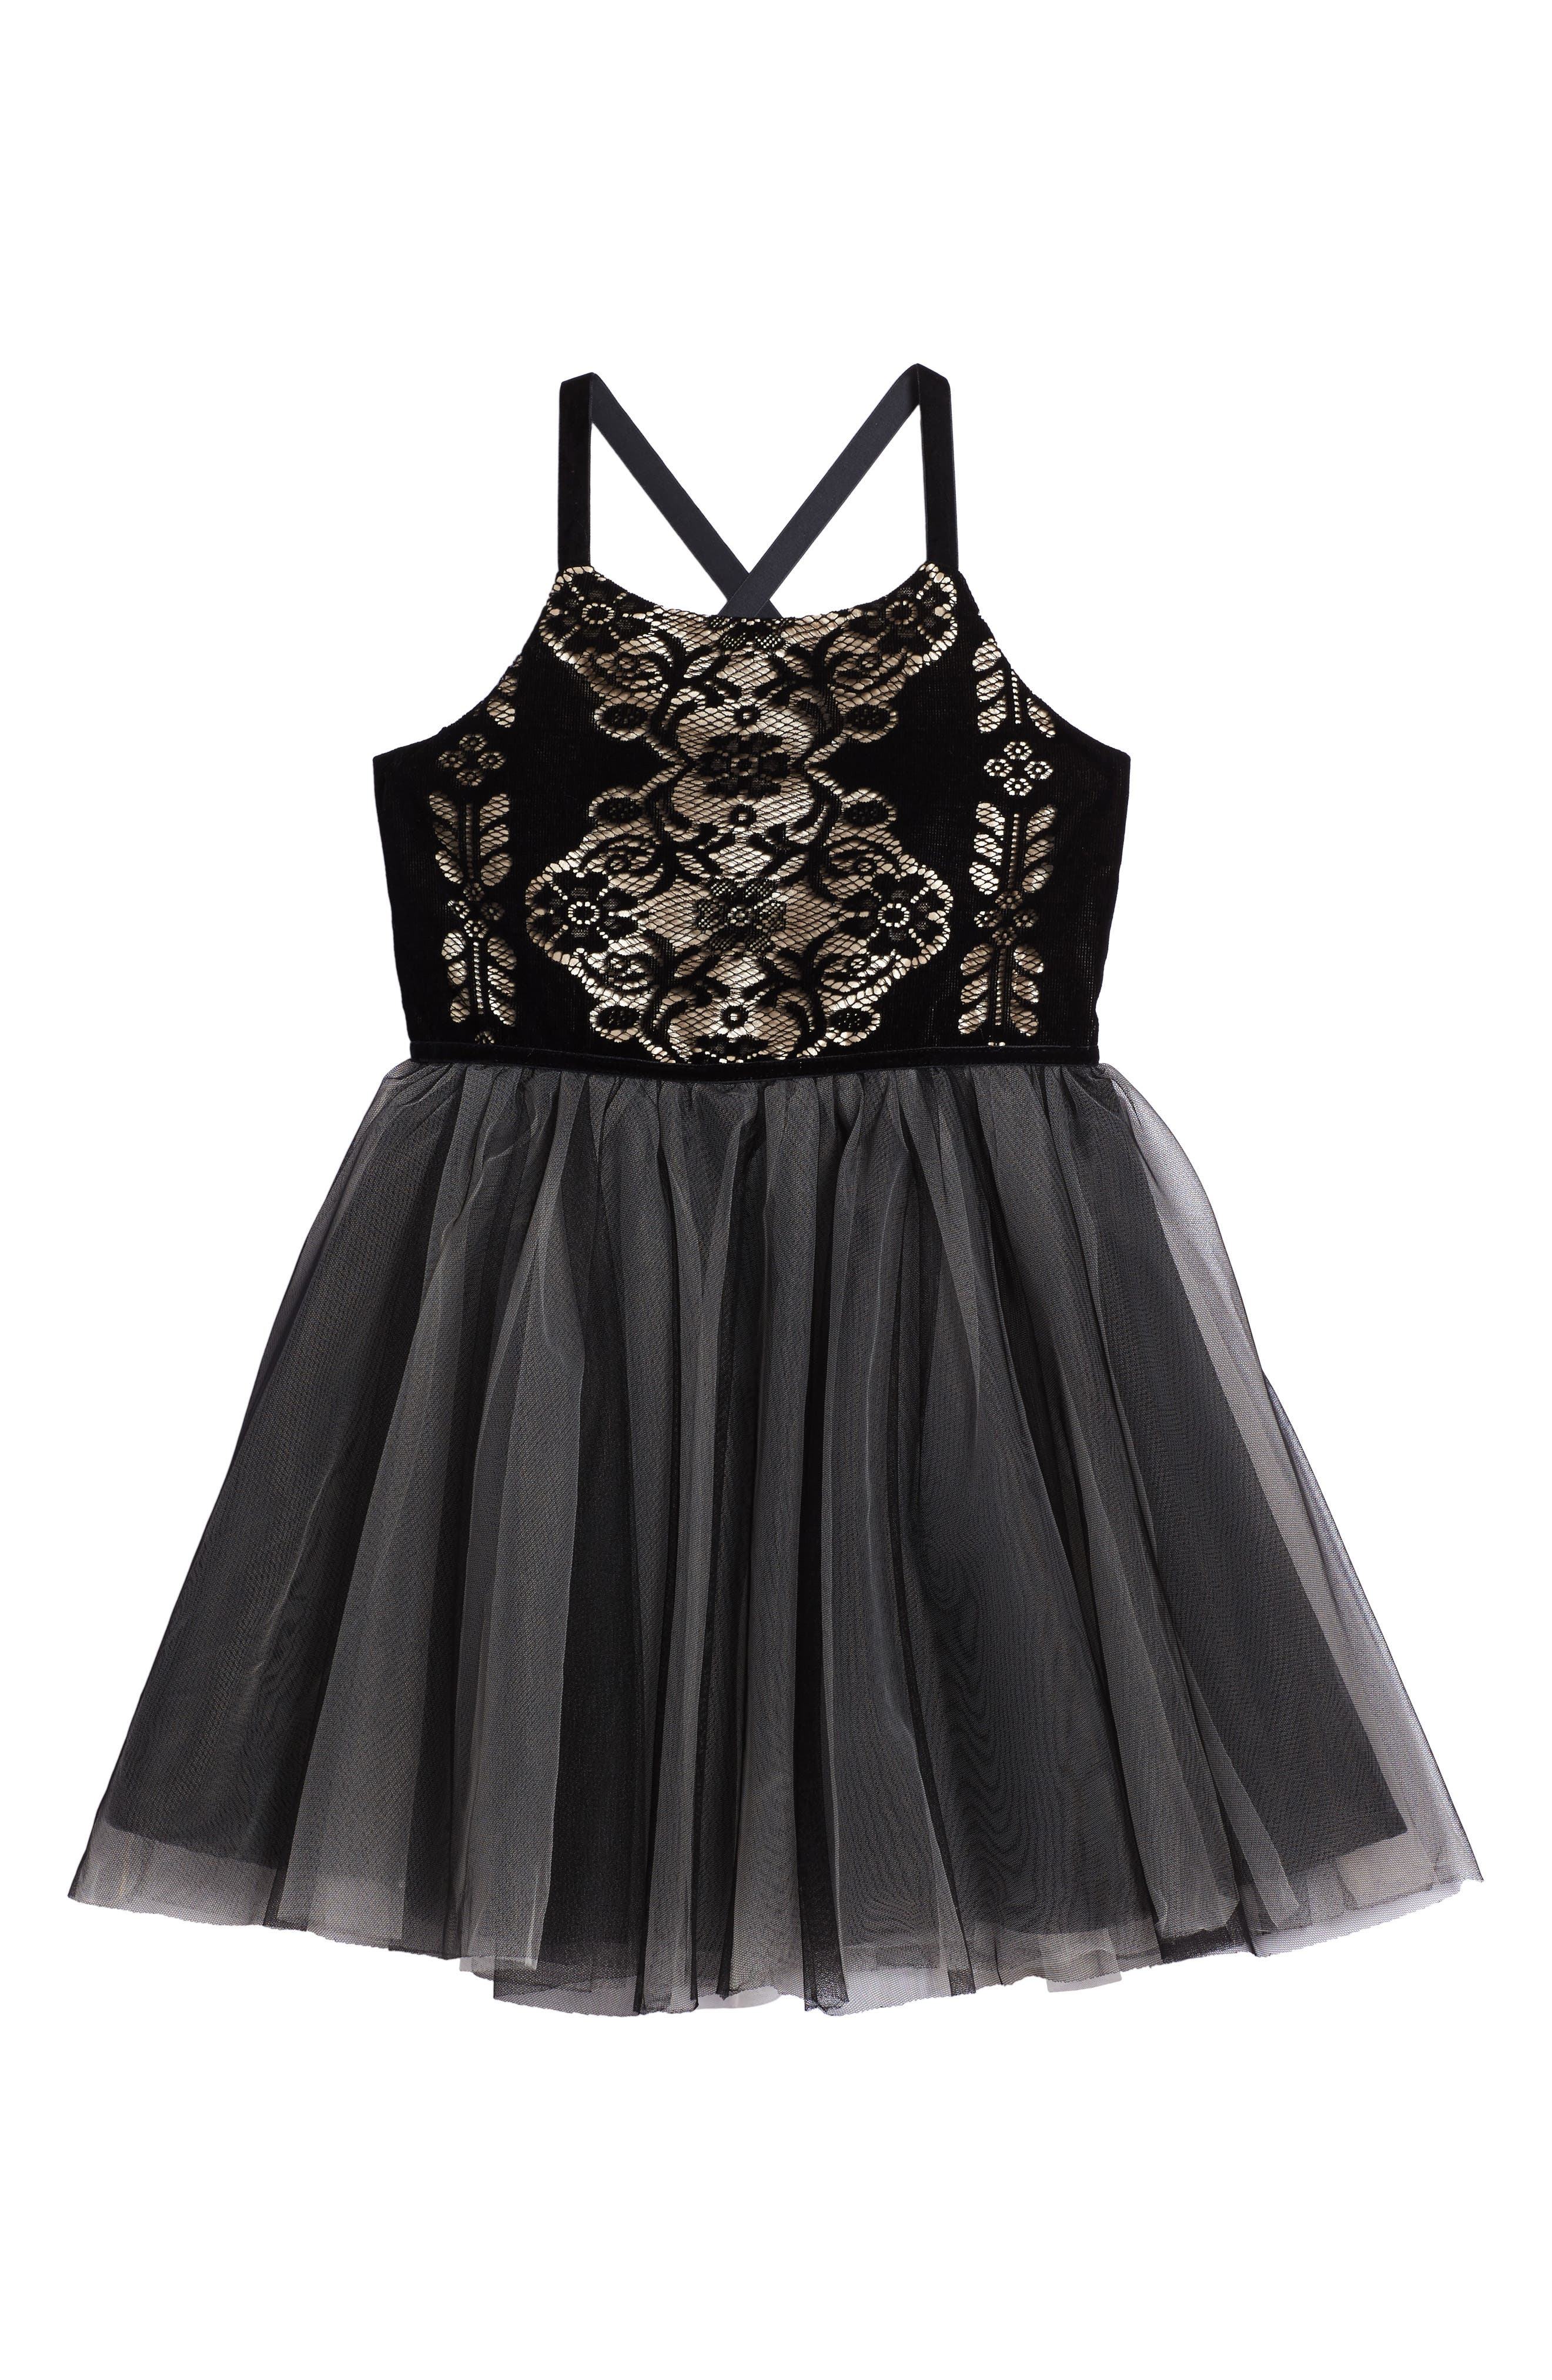 Main Image - Zunie Burnout Lace Velvet & Tulle Dress (Big Girls)